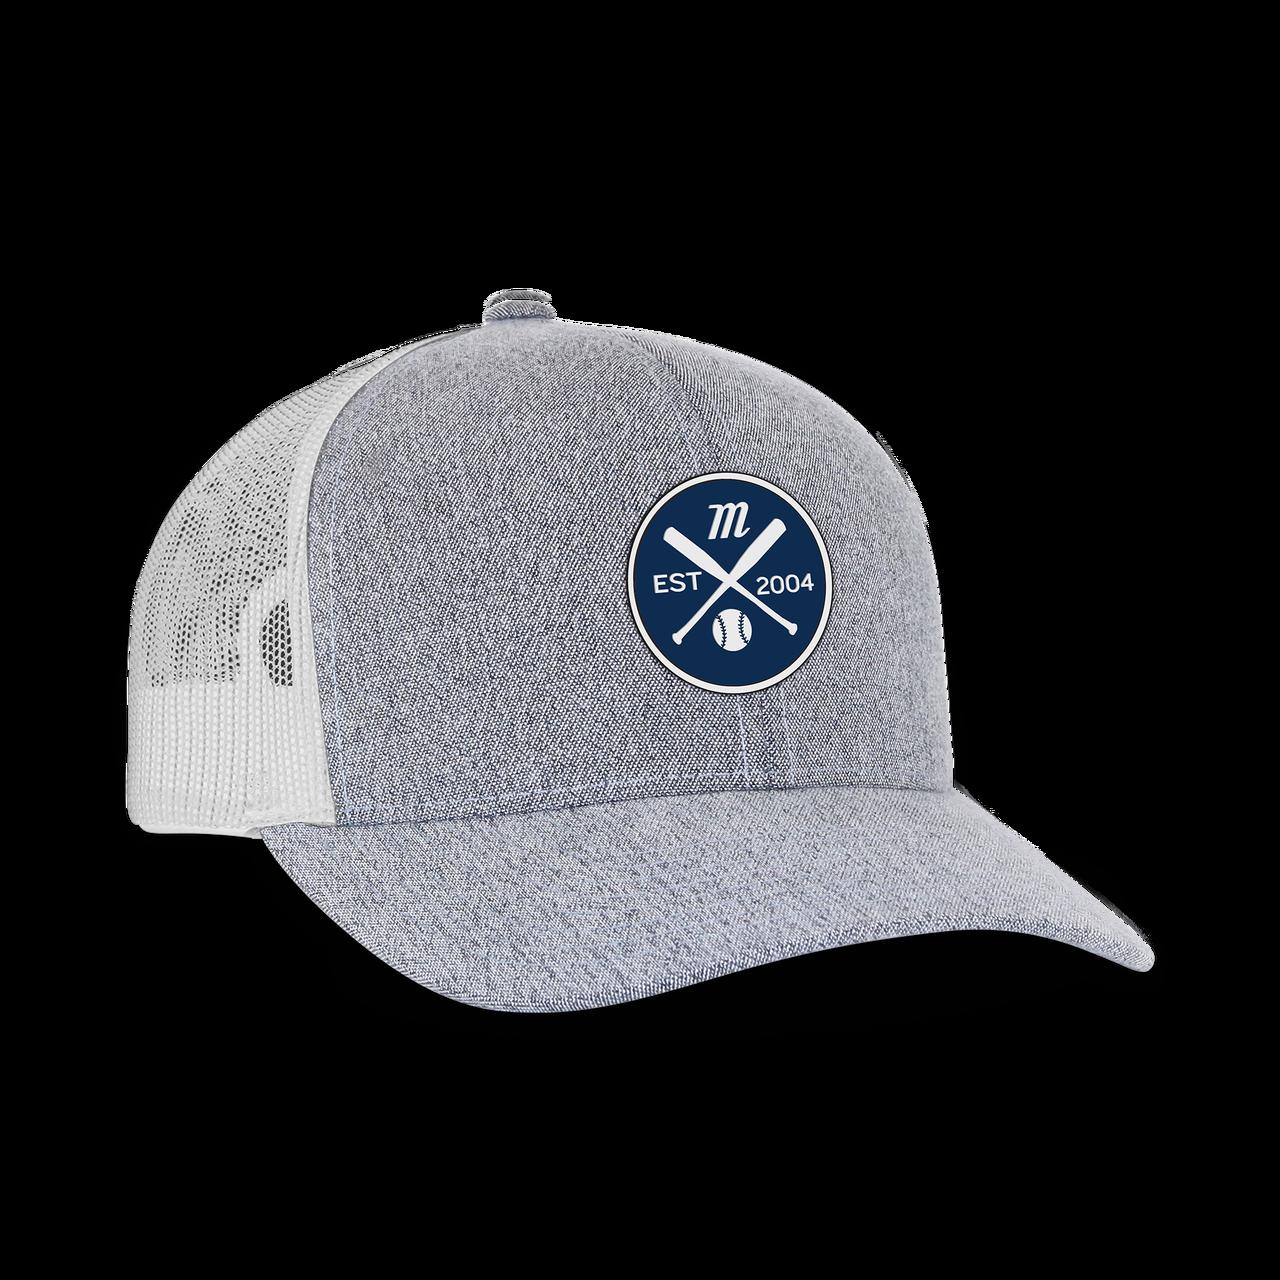 f0012f6dc45 Established Patch Snapback Hat - Marucci Sports